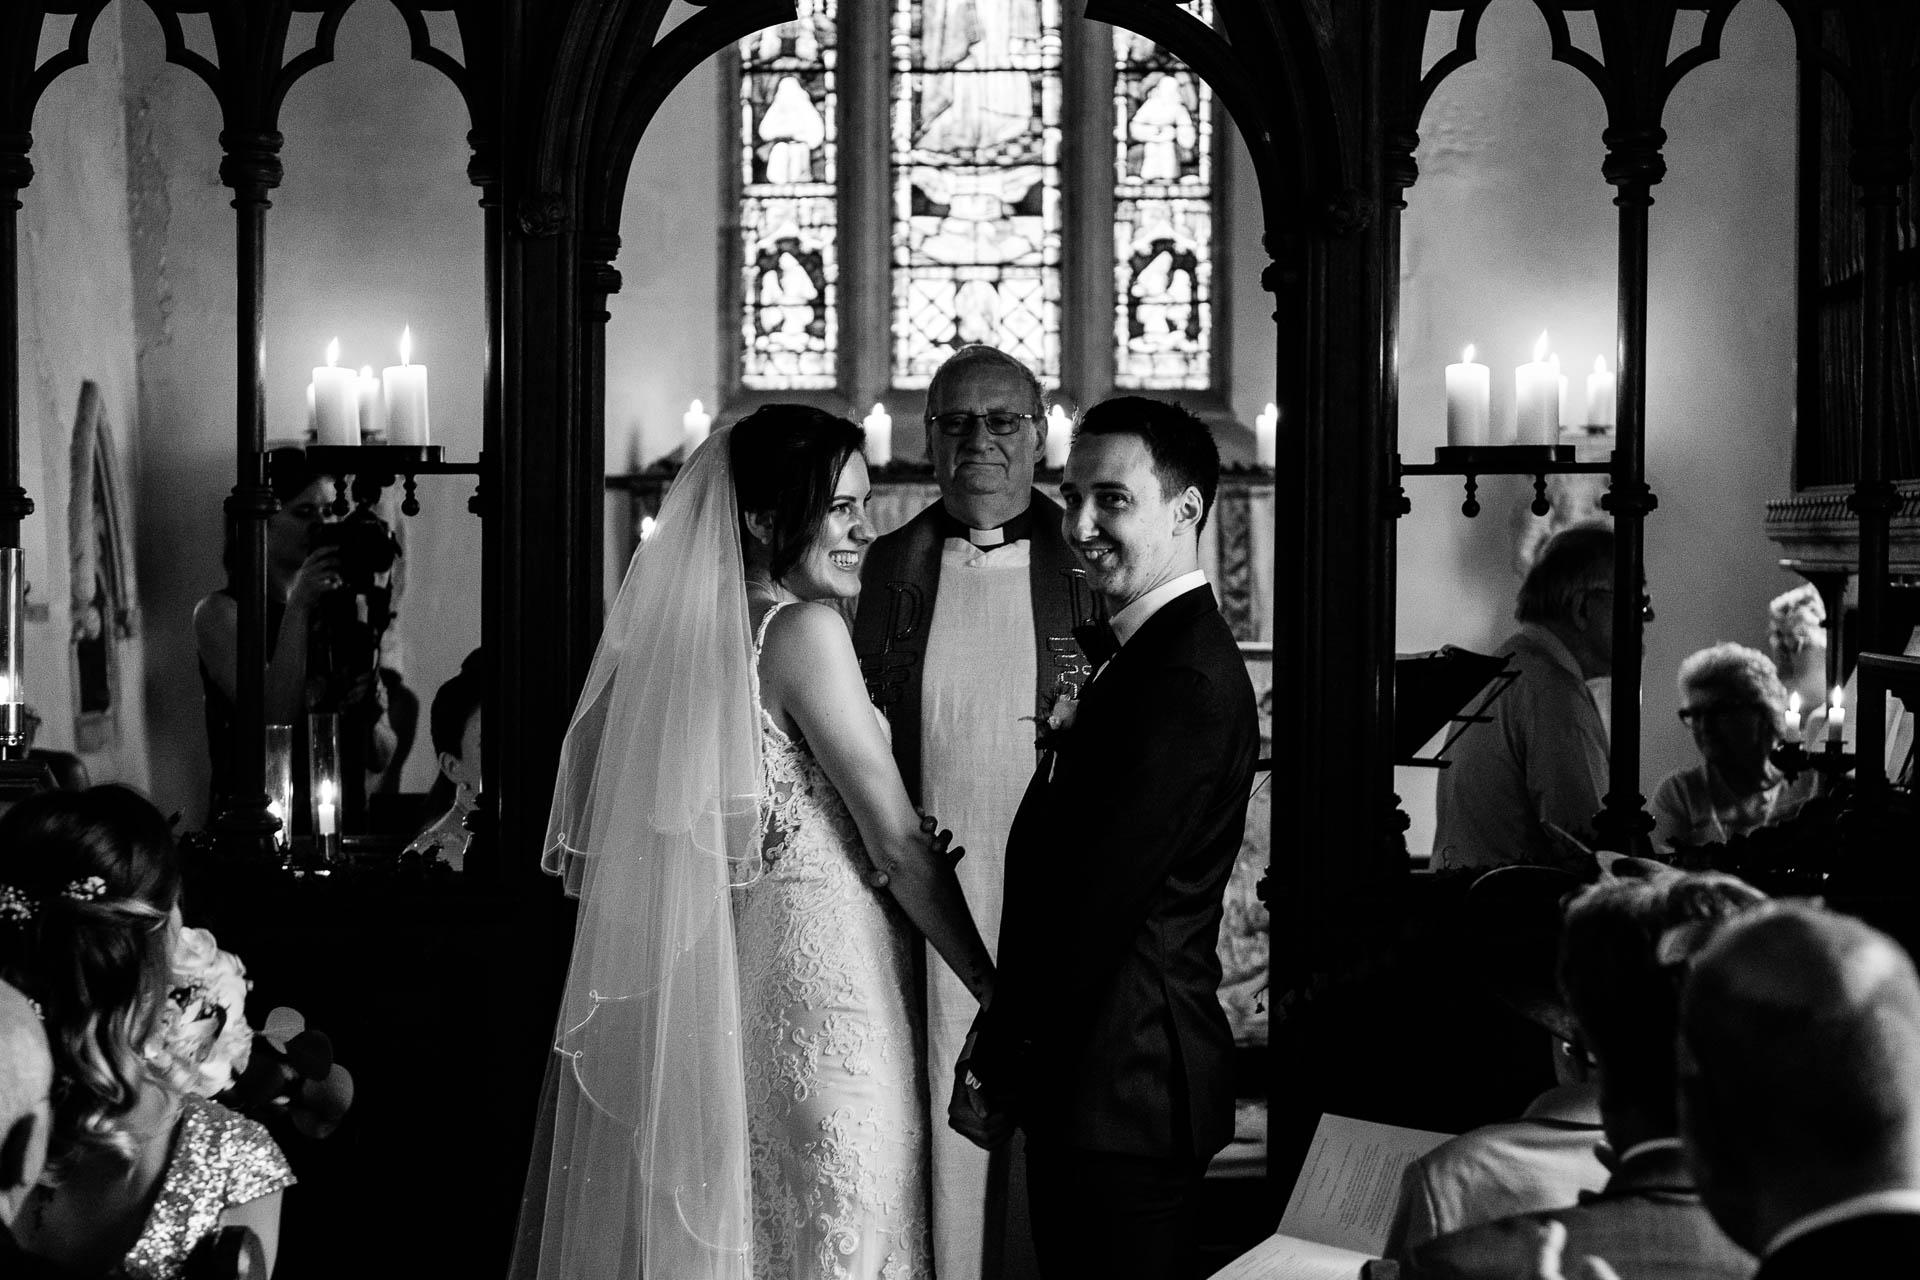 orchardleigh house wedding - Danni & Barney (141).jpg